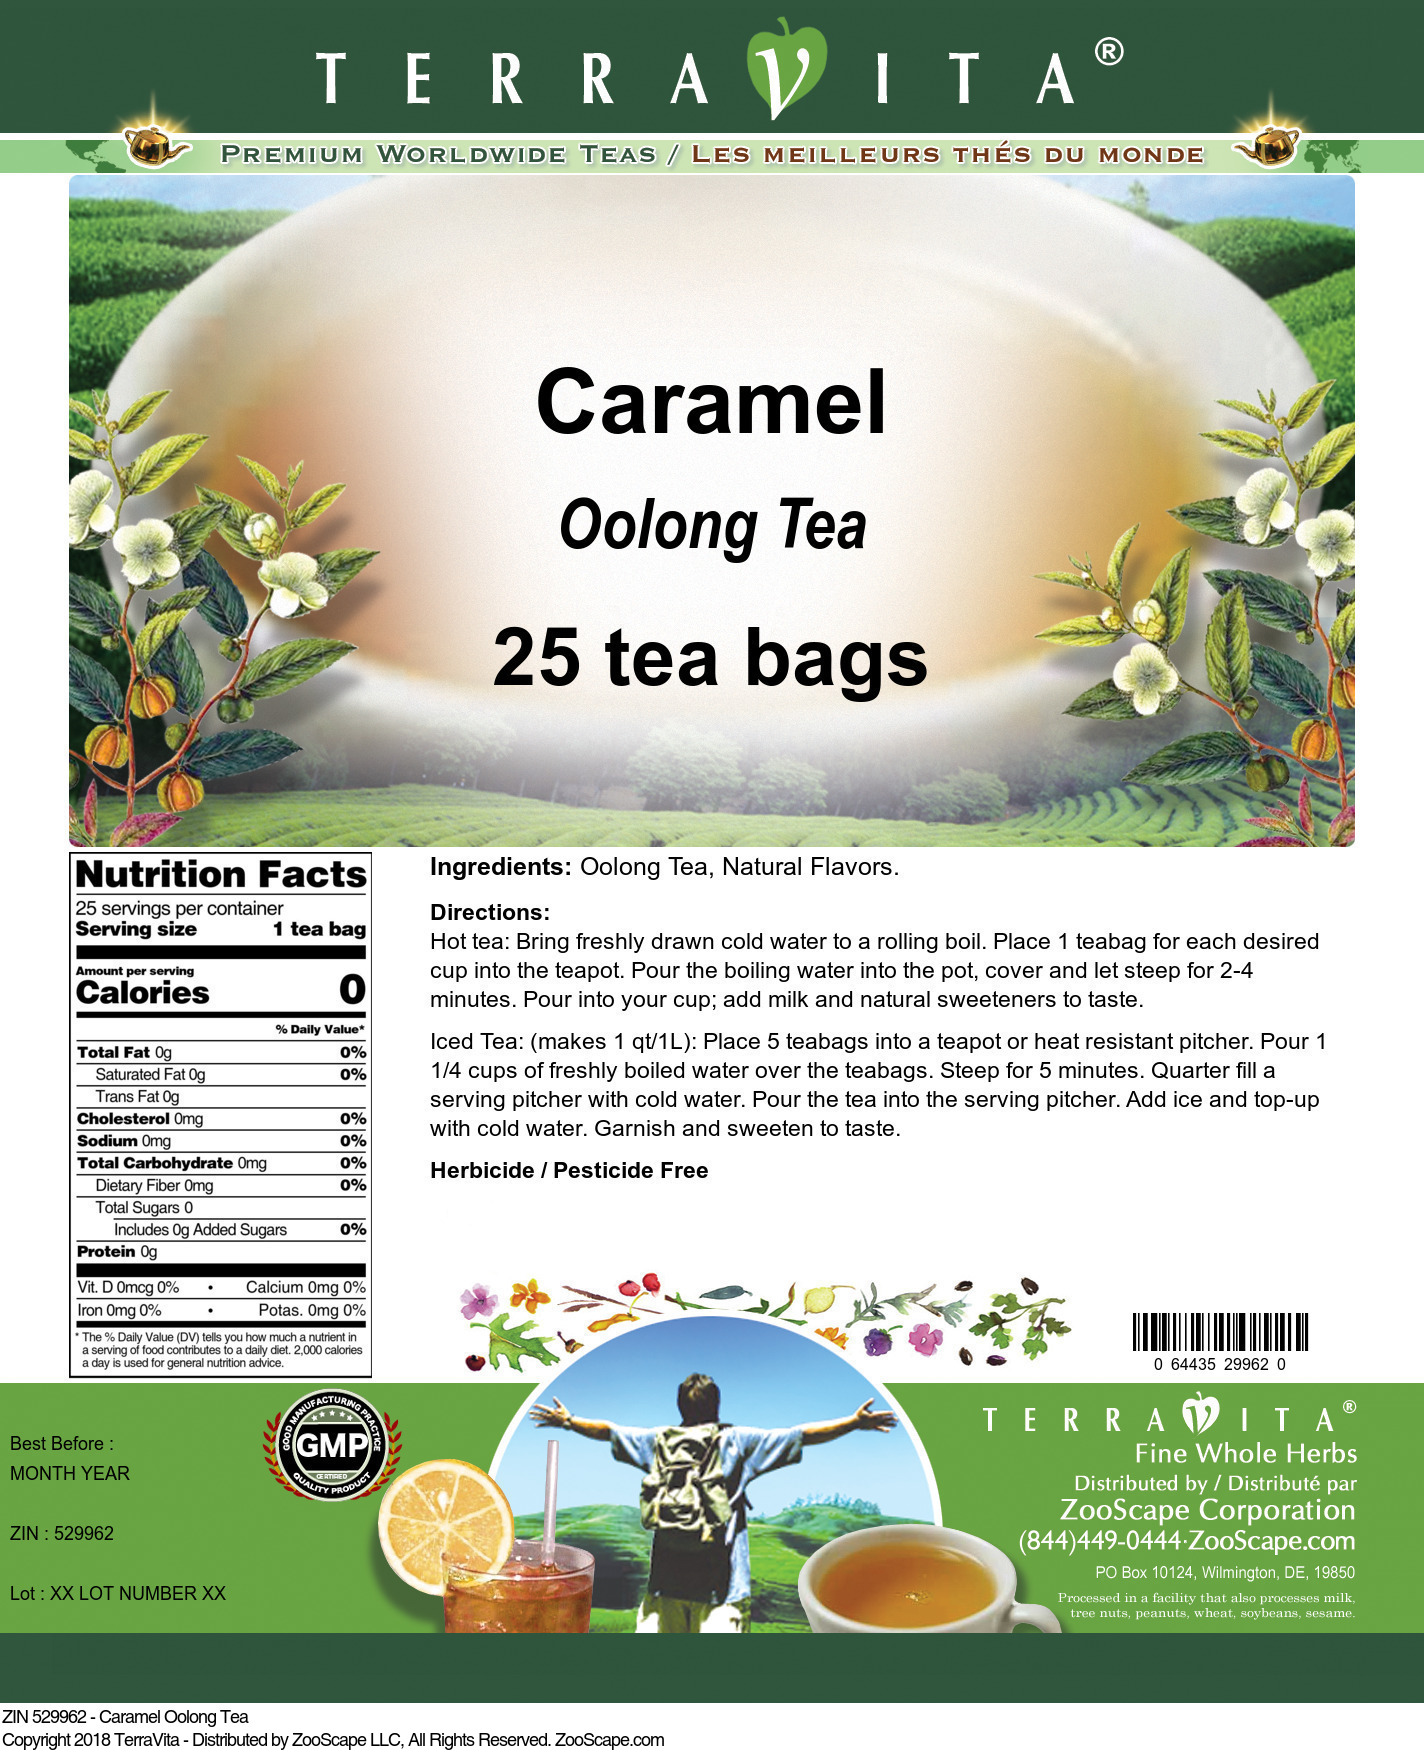 Caramel Oolong Tea